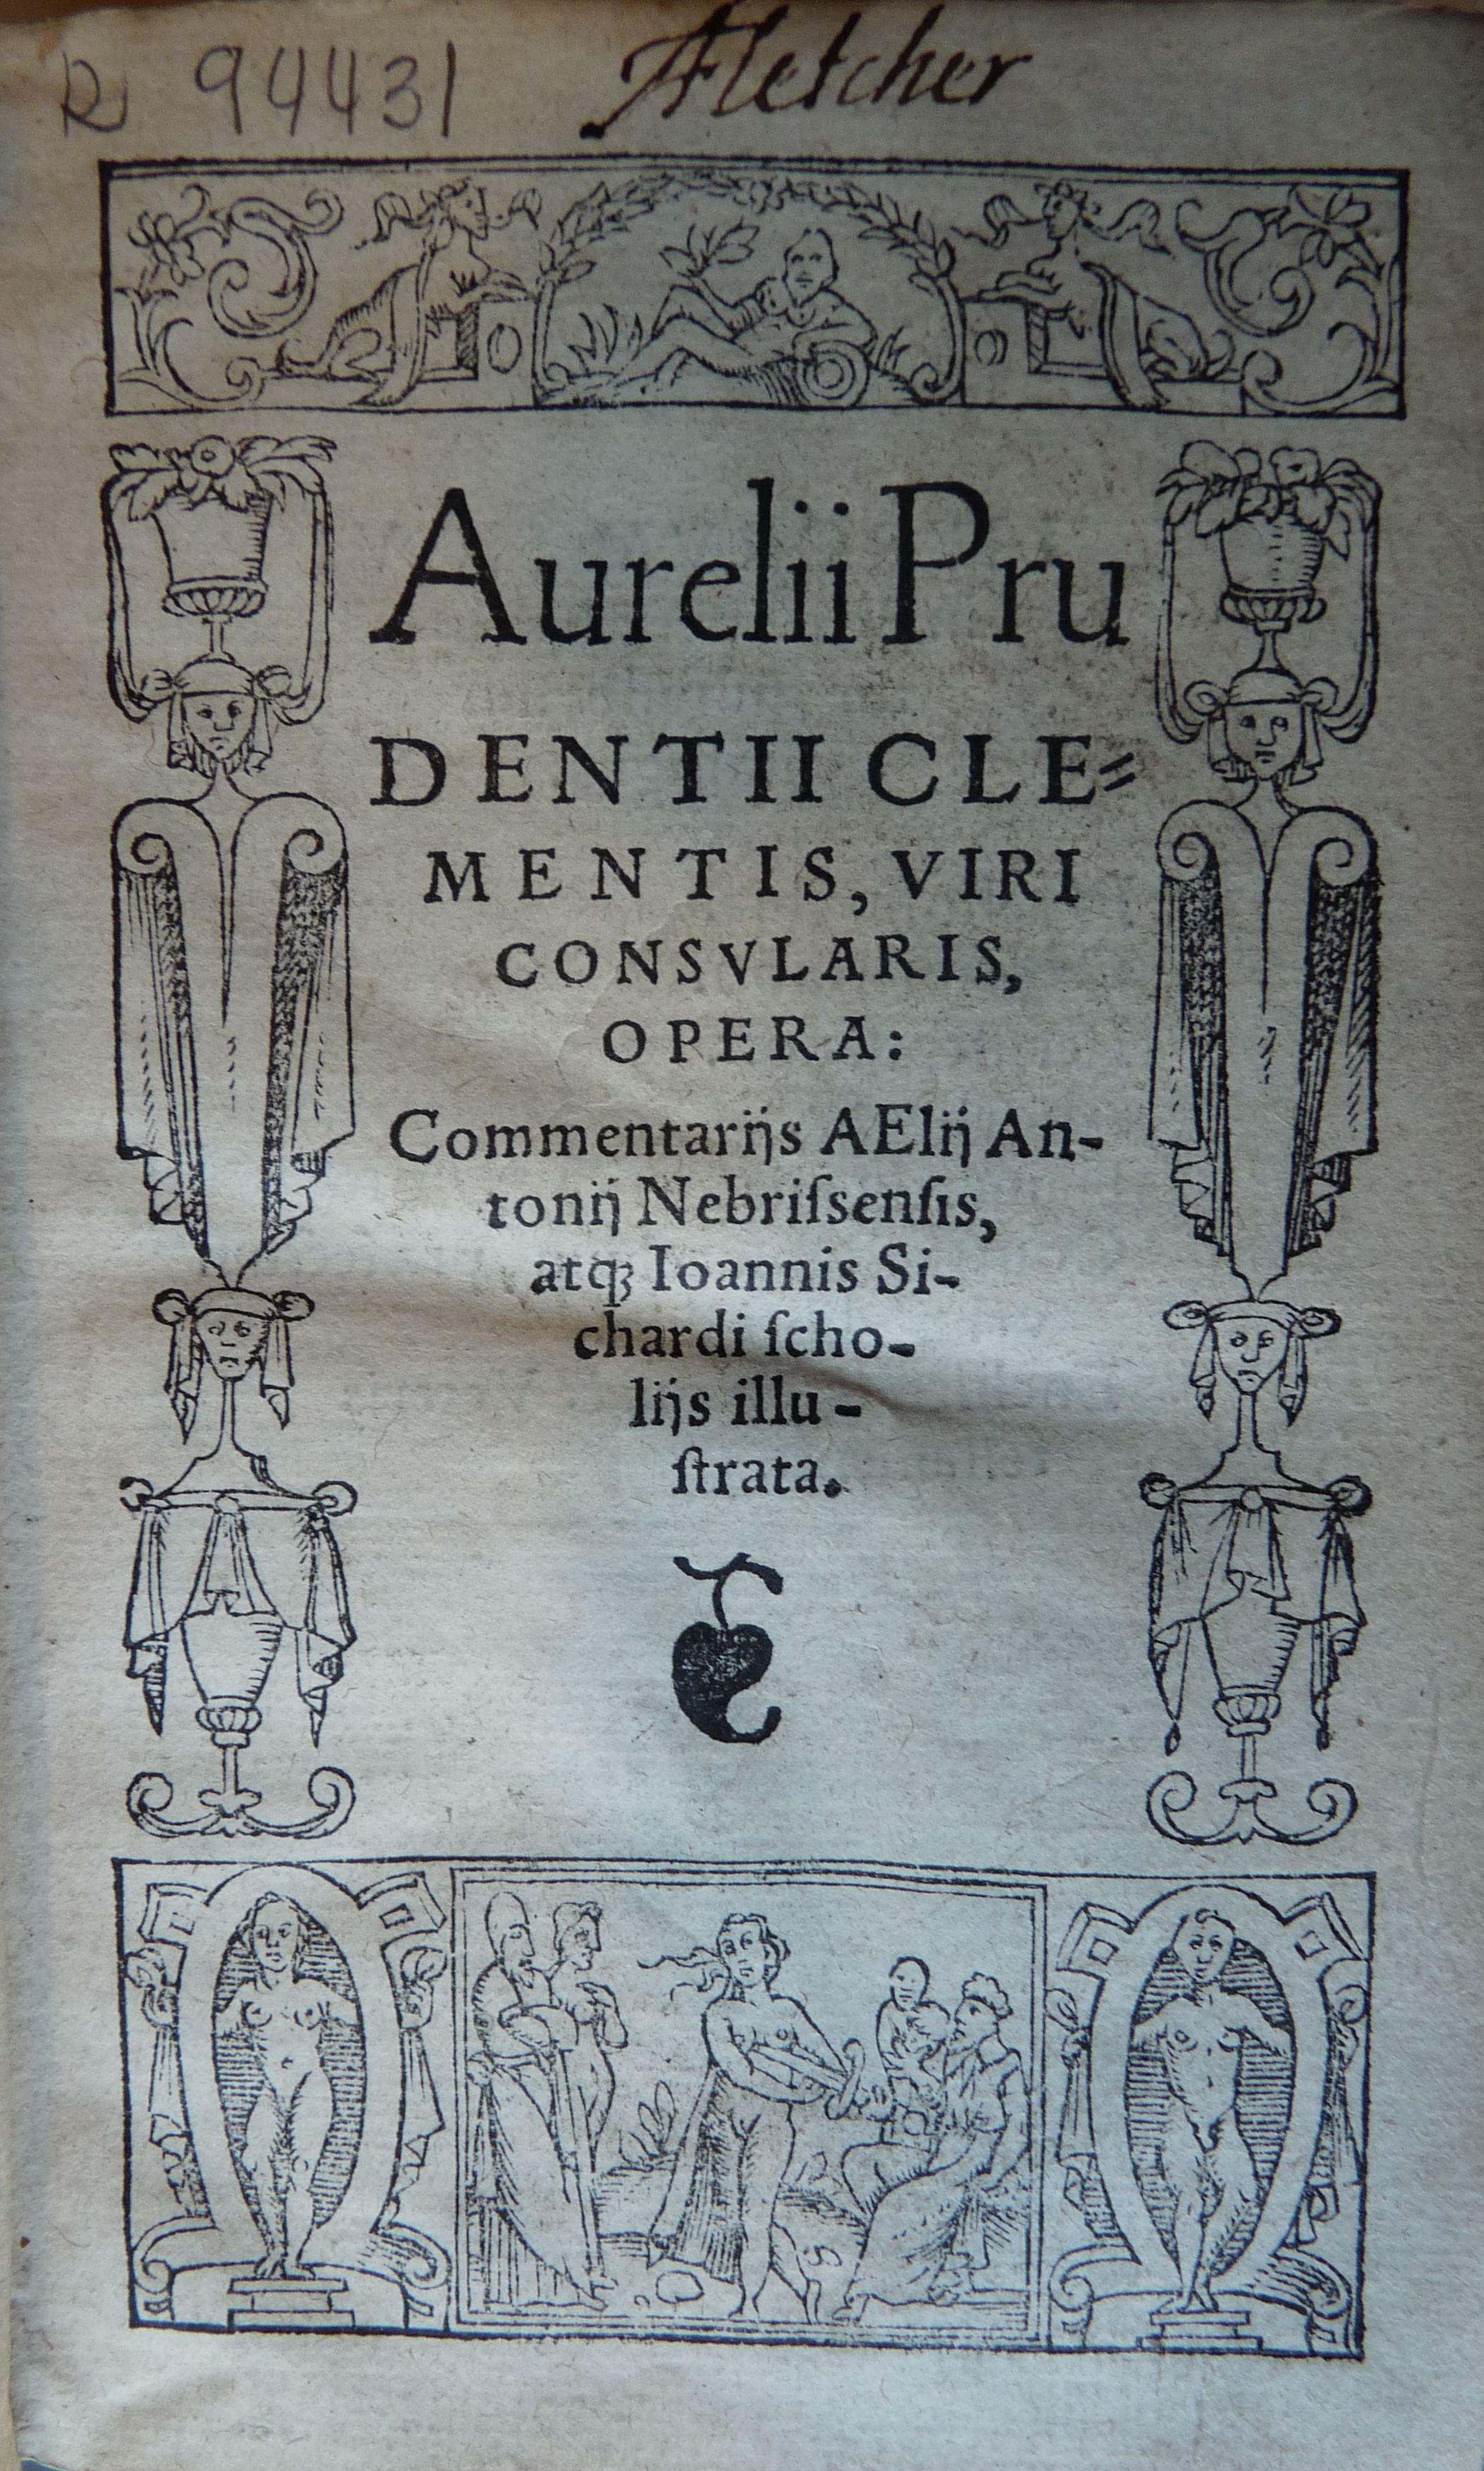 Aurelii Prudentii Clementis ... Opera, 1546